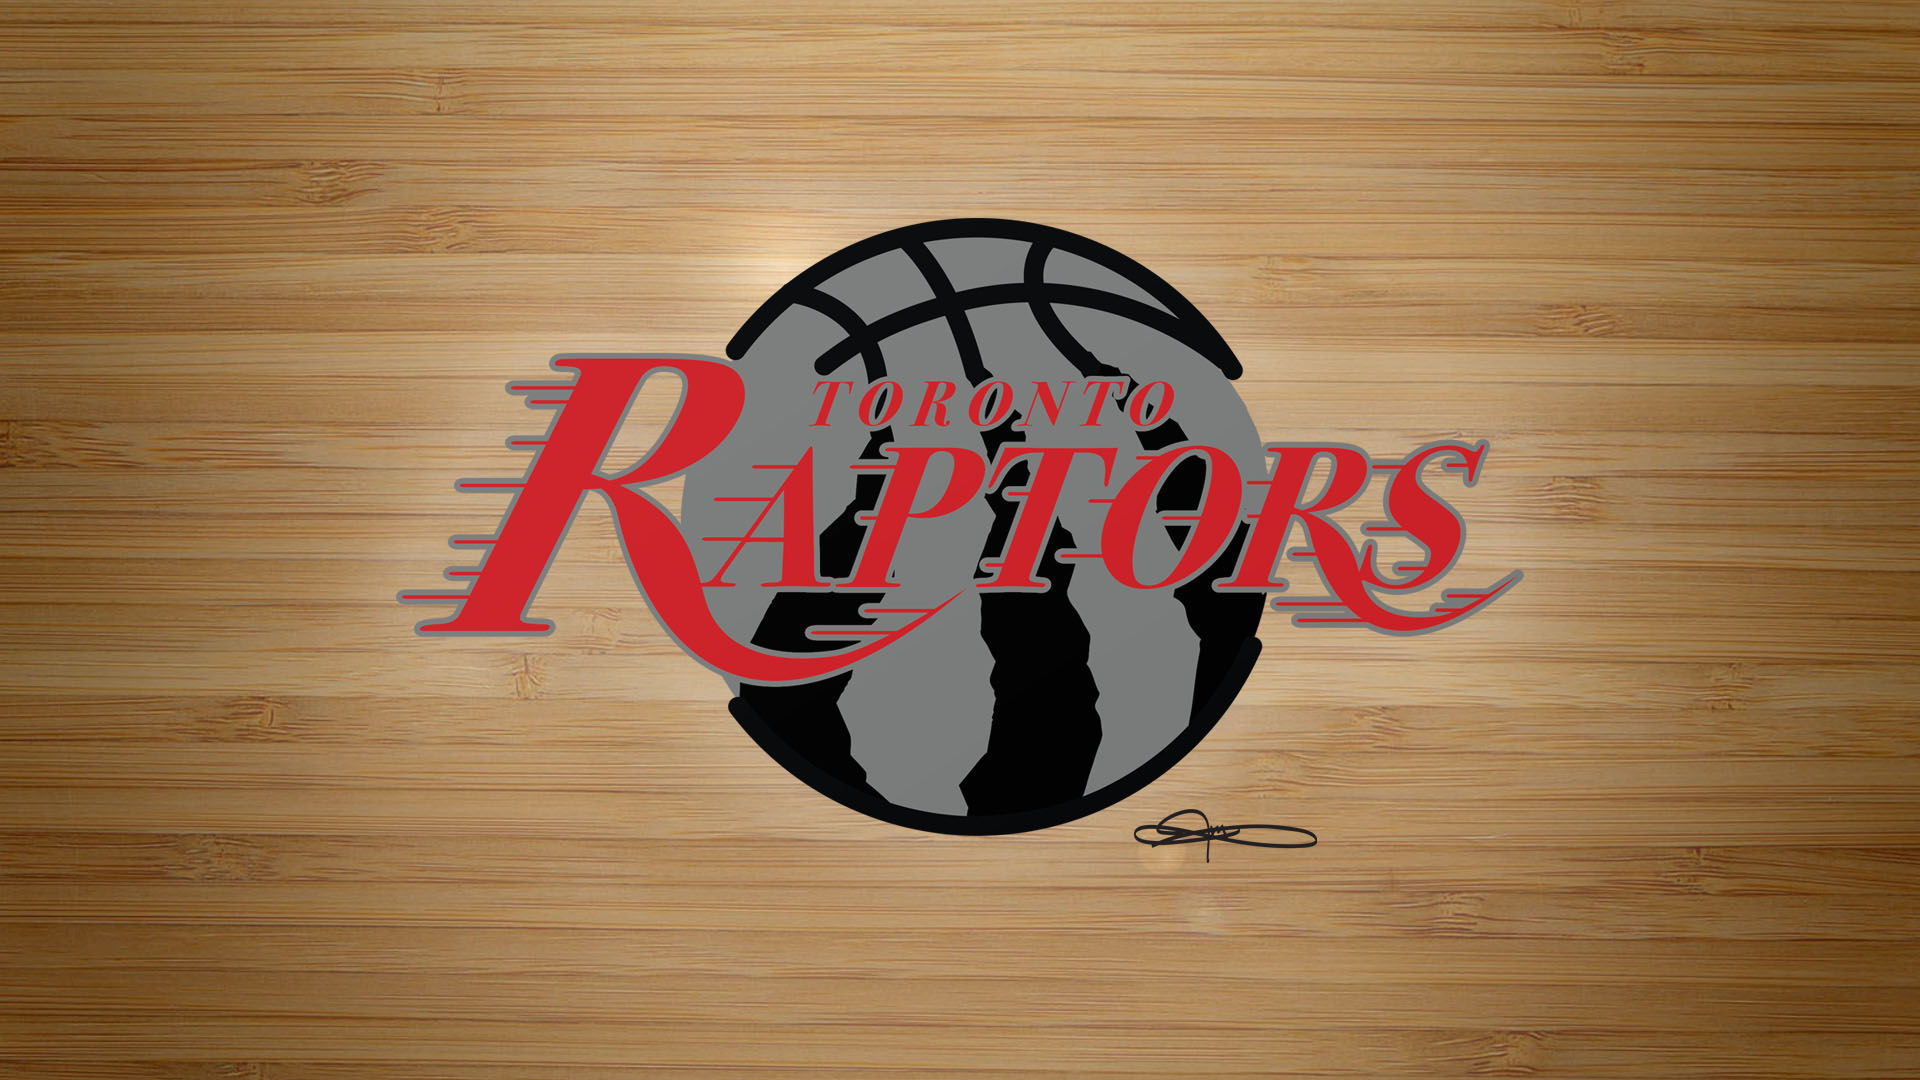 Raptors X Lakers